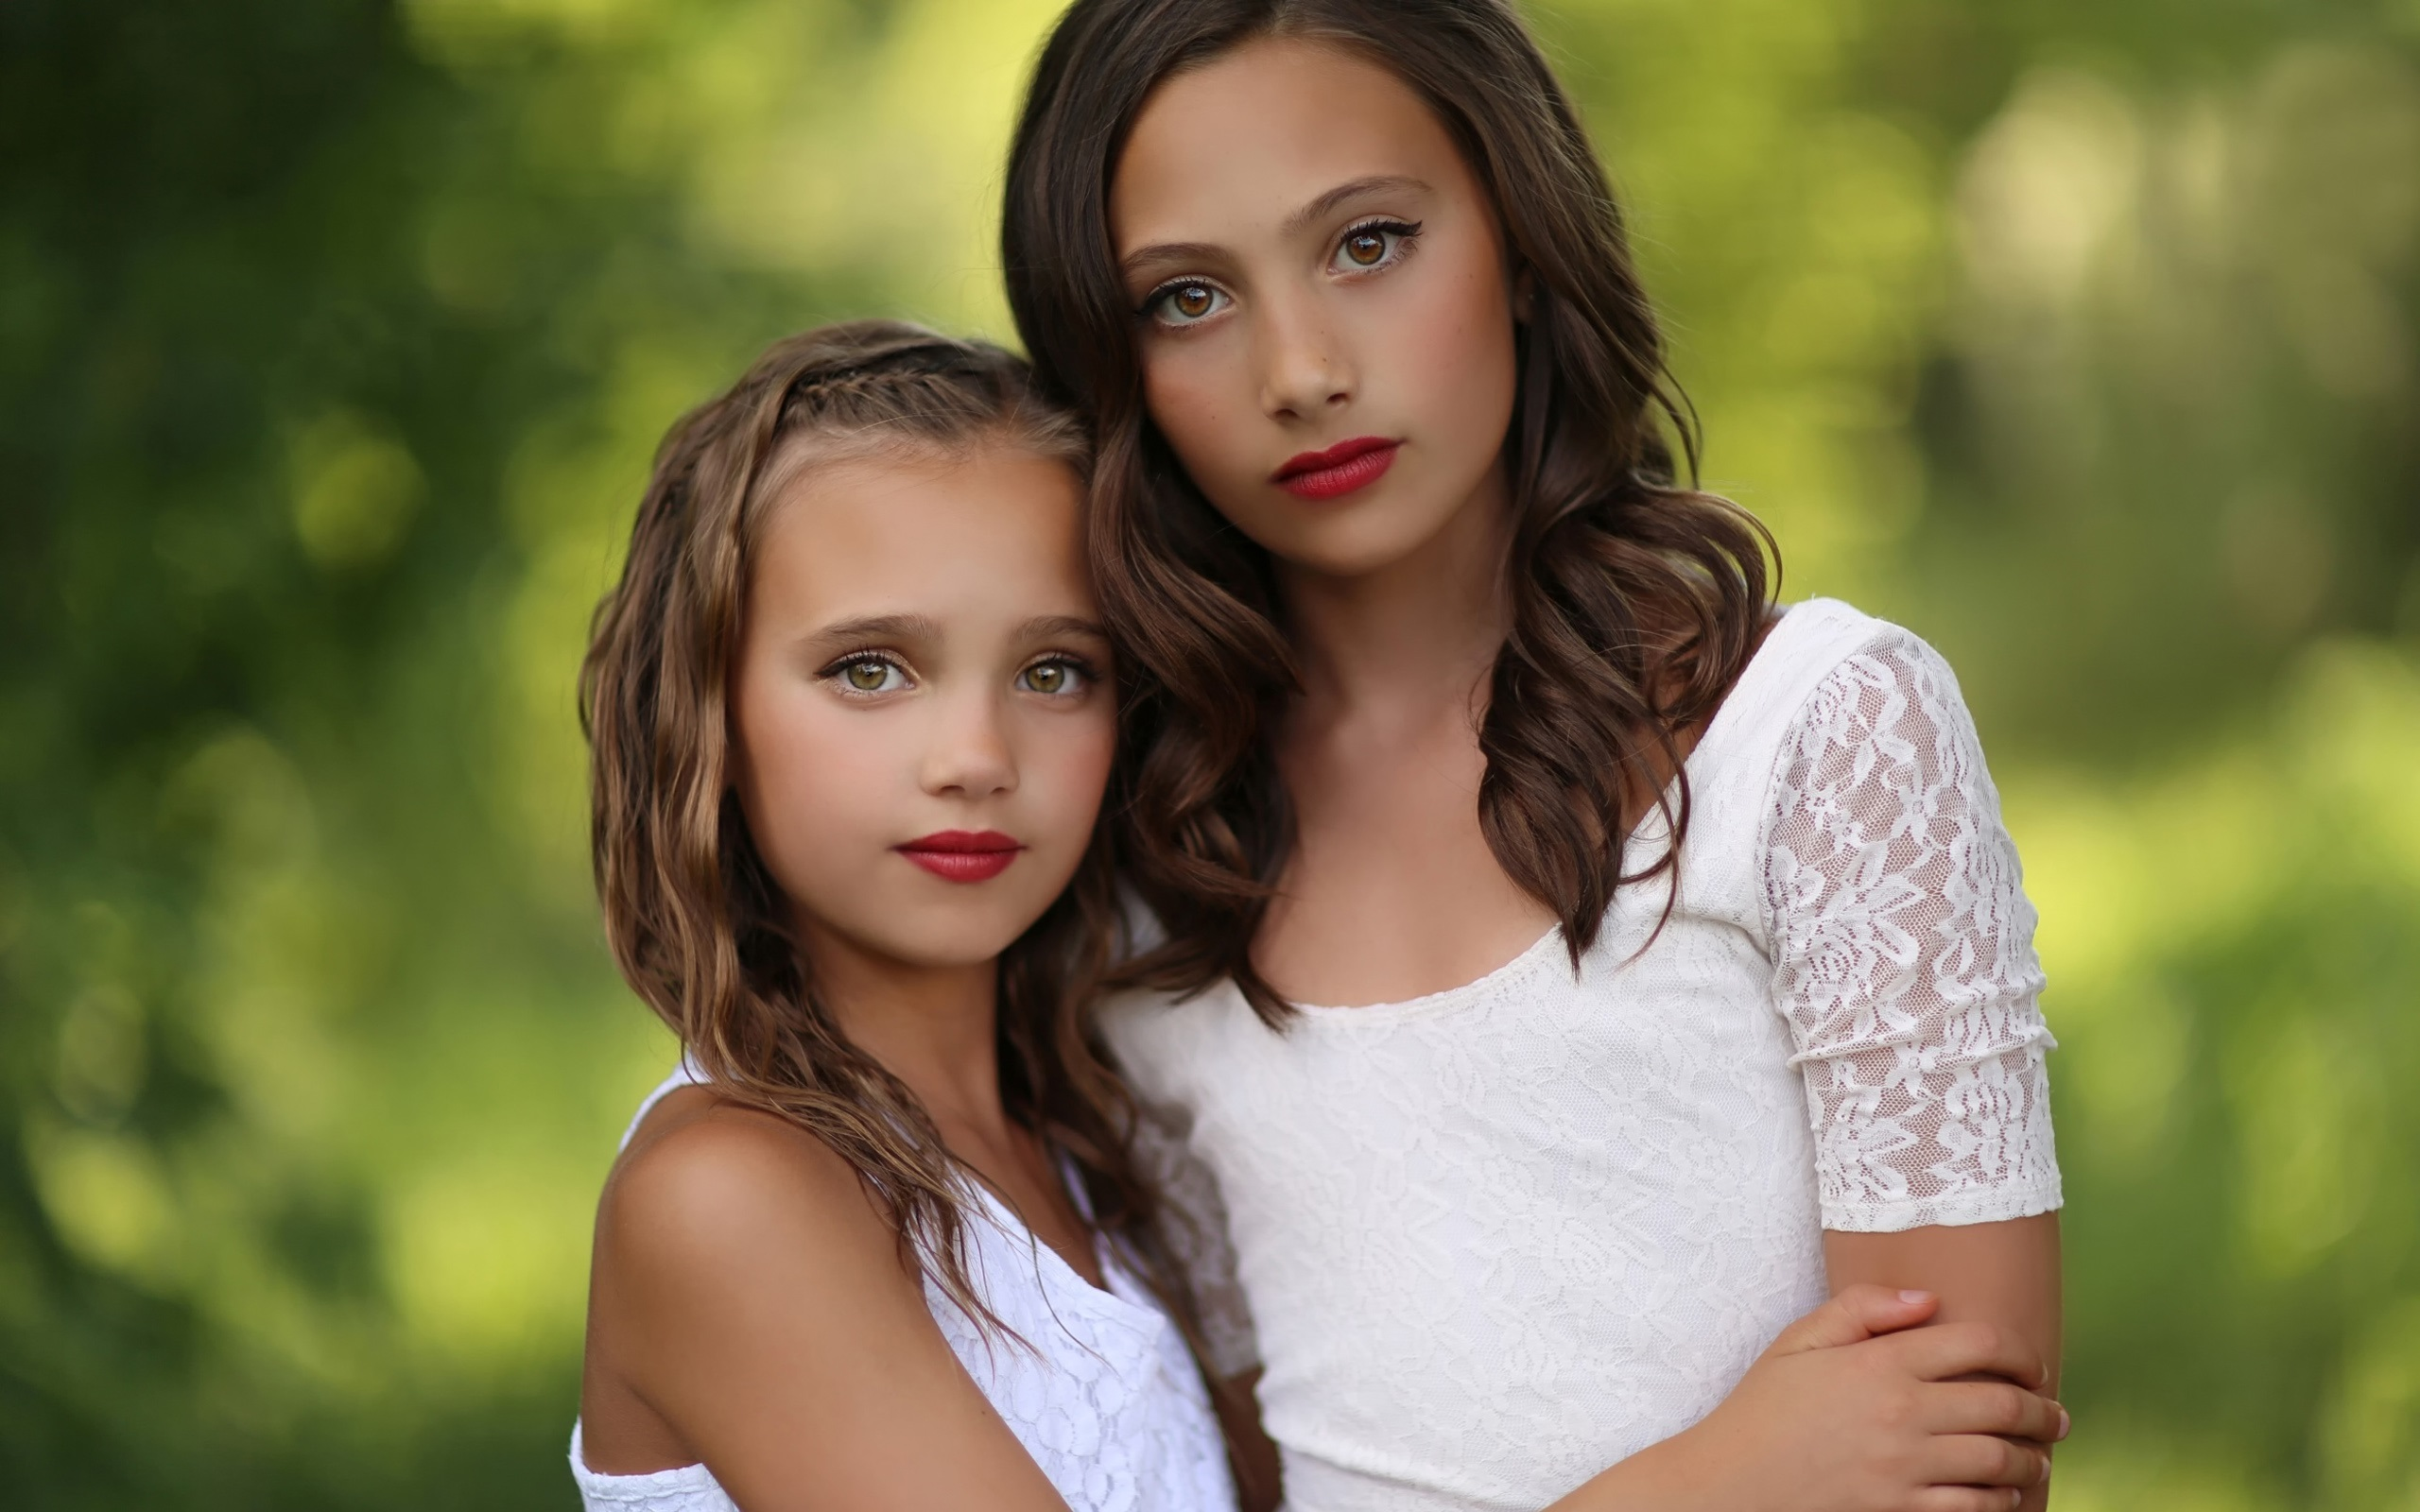 Картинки, картинки про сестер красивые